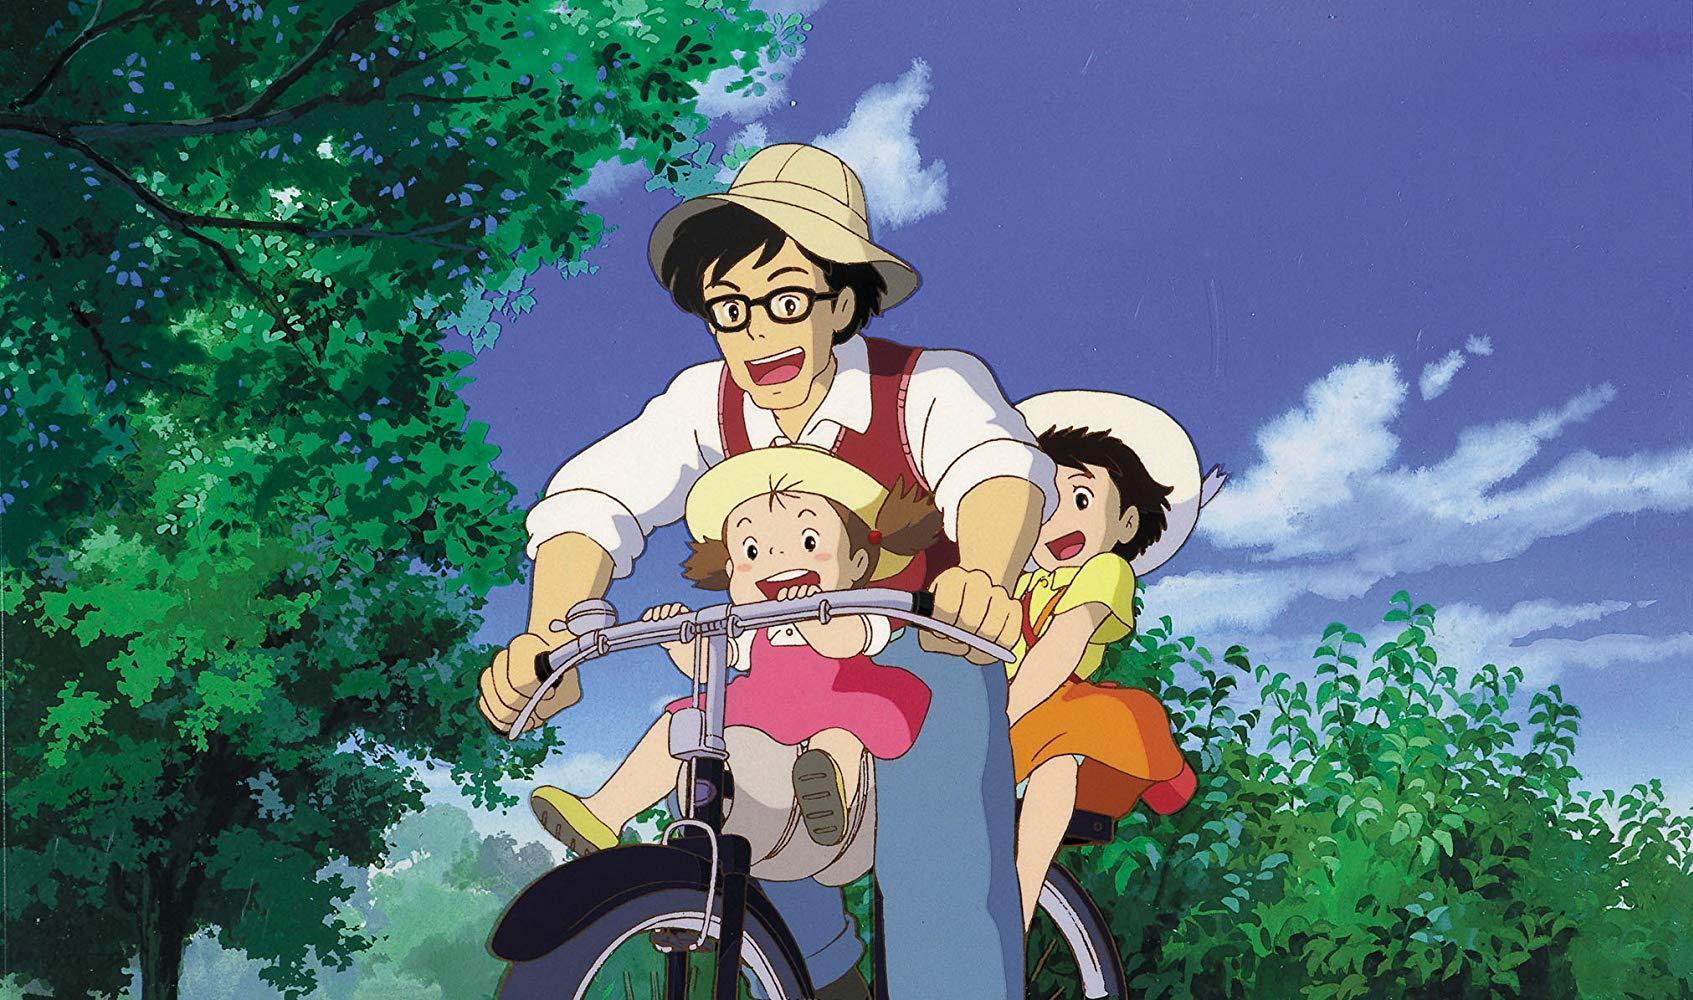 فيلم My Neighbor Totoro 1988 مترجم